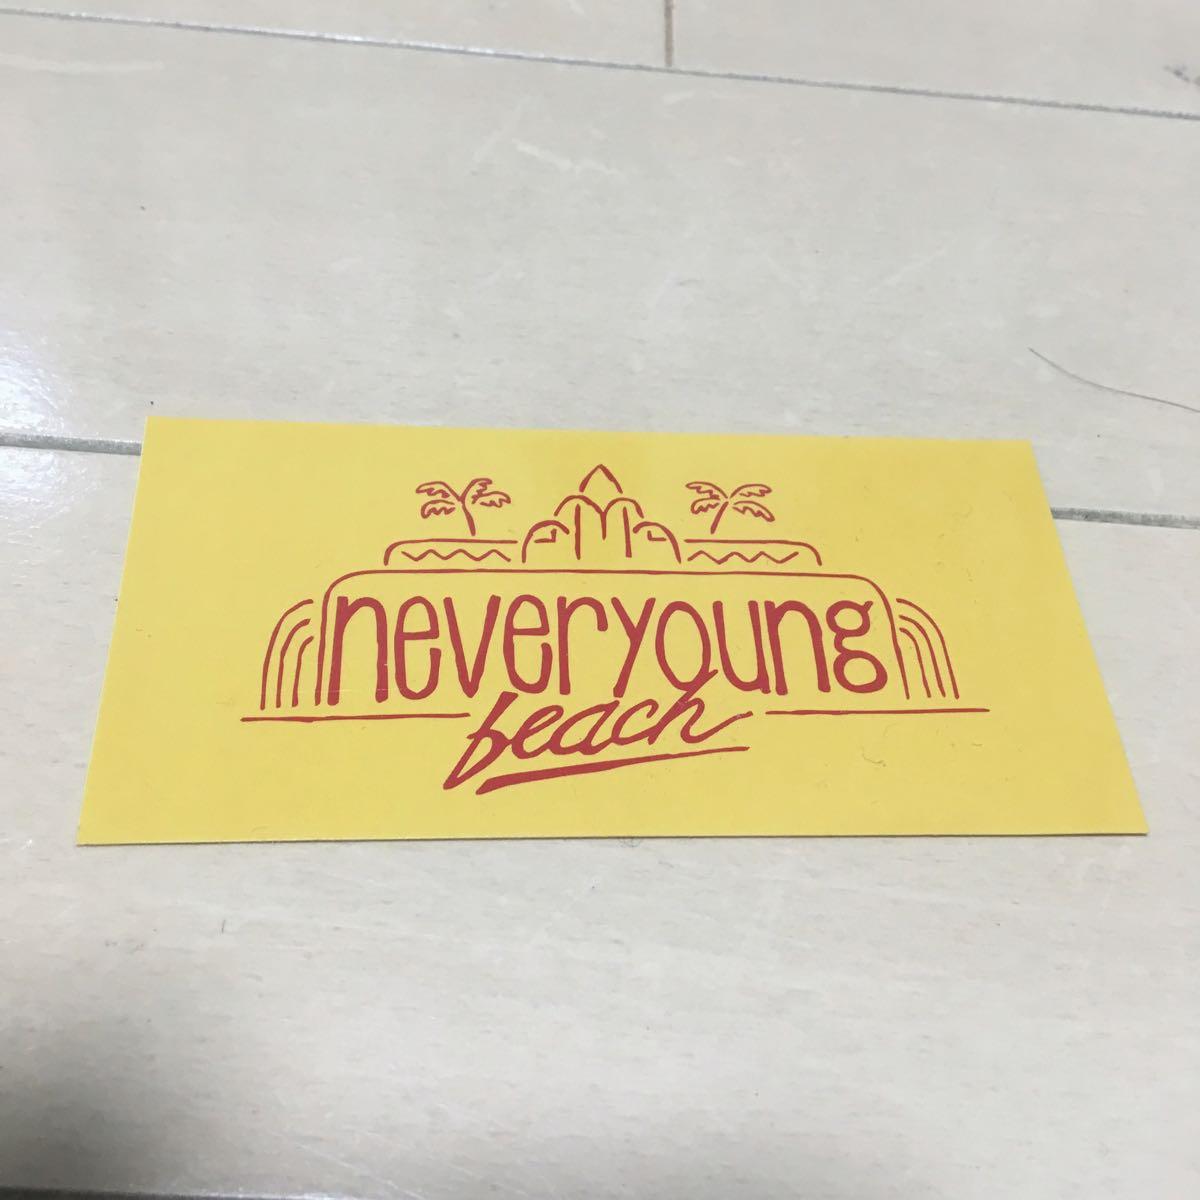 【非売品】 Never Young Beach 購入者特典 ステッカー (縦5cm x 横10cm) Suchmos Nulbarich